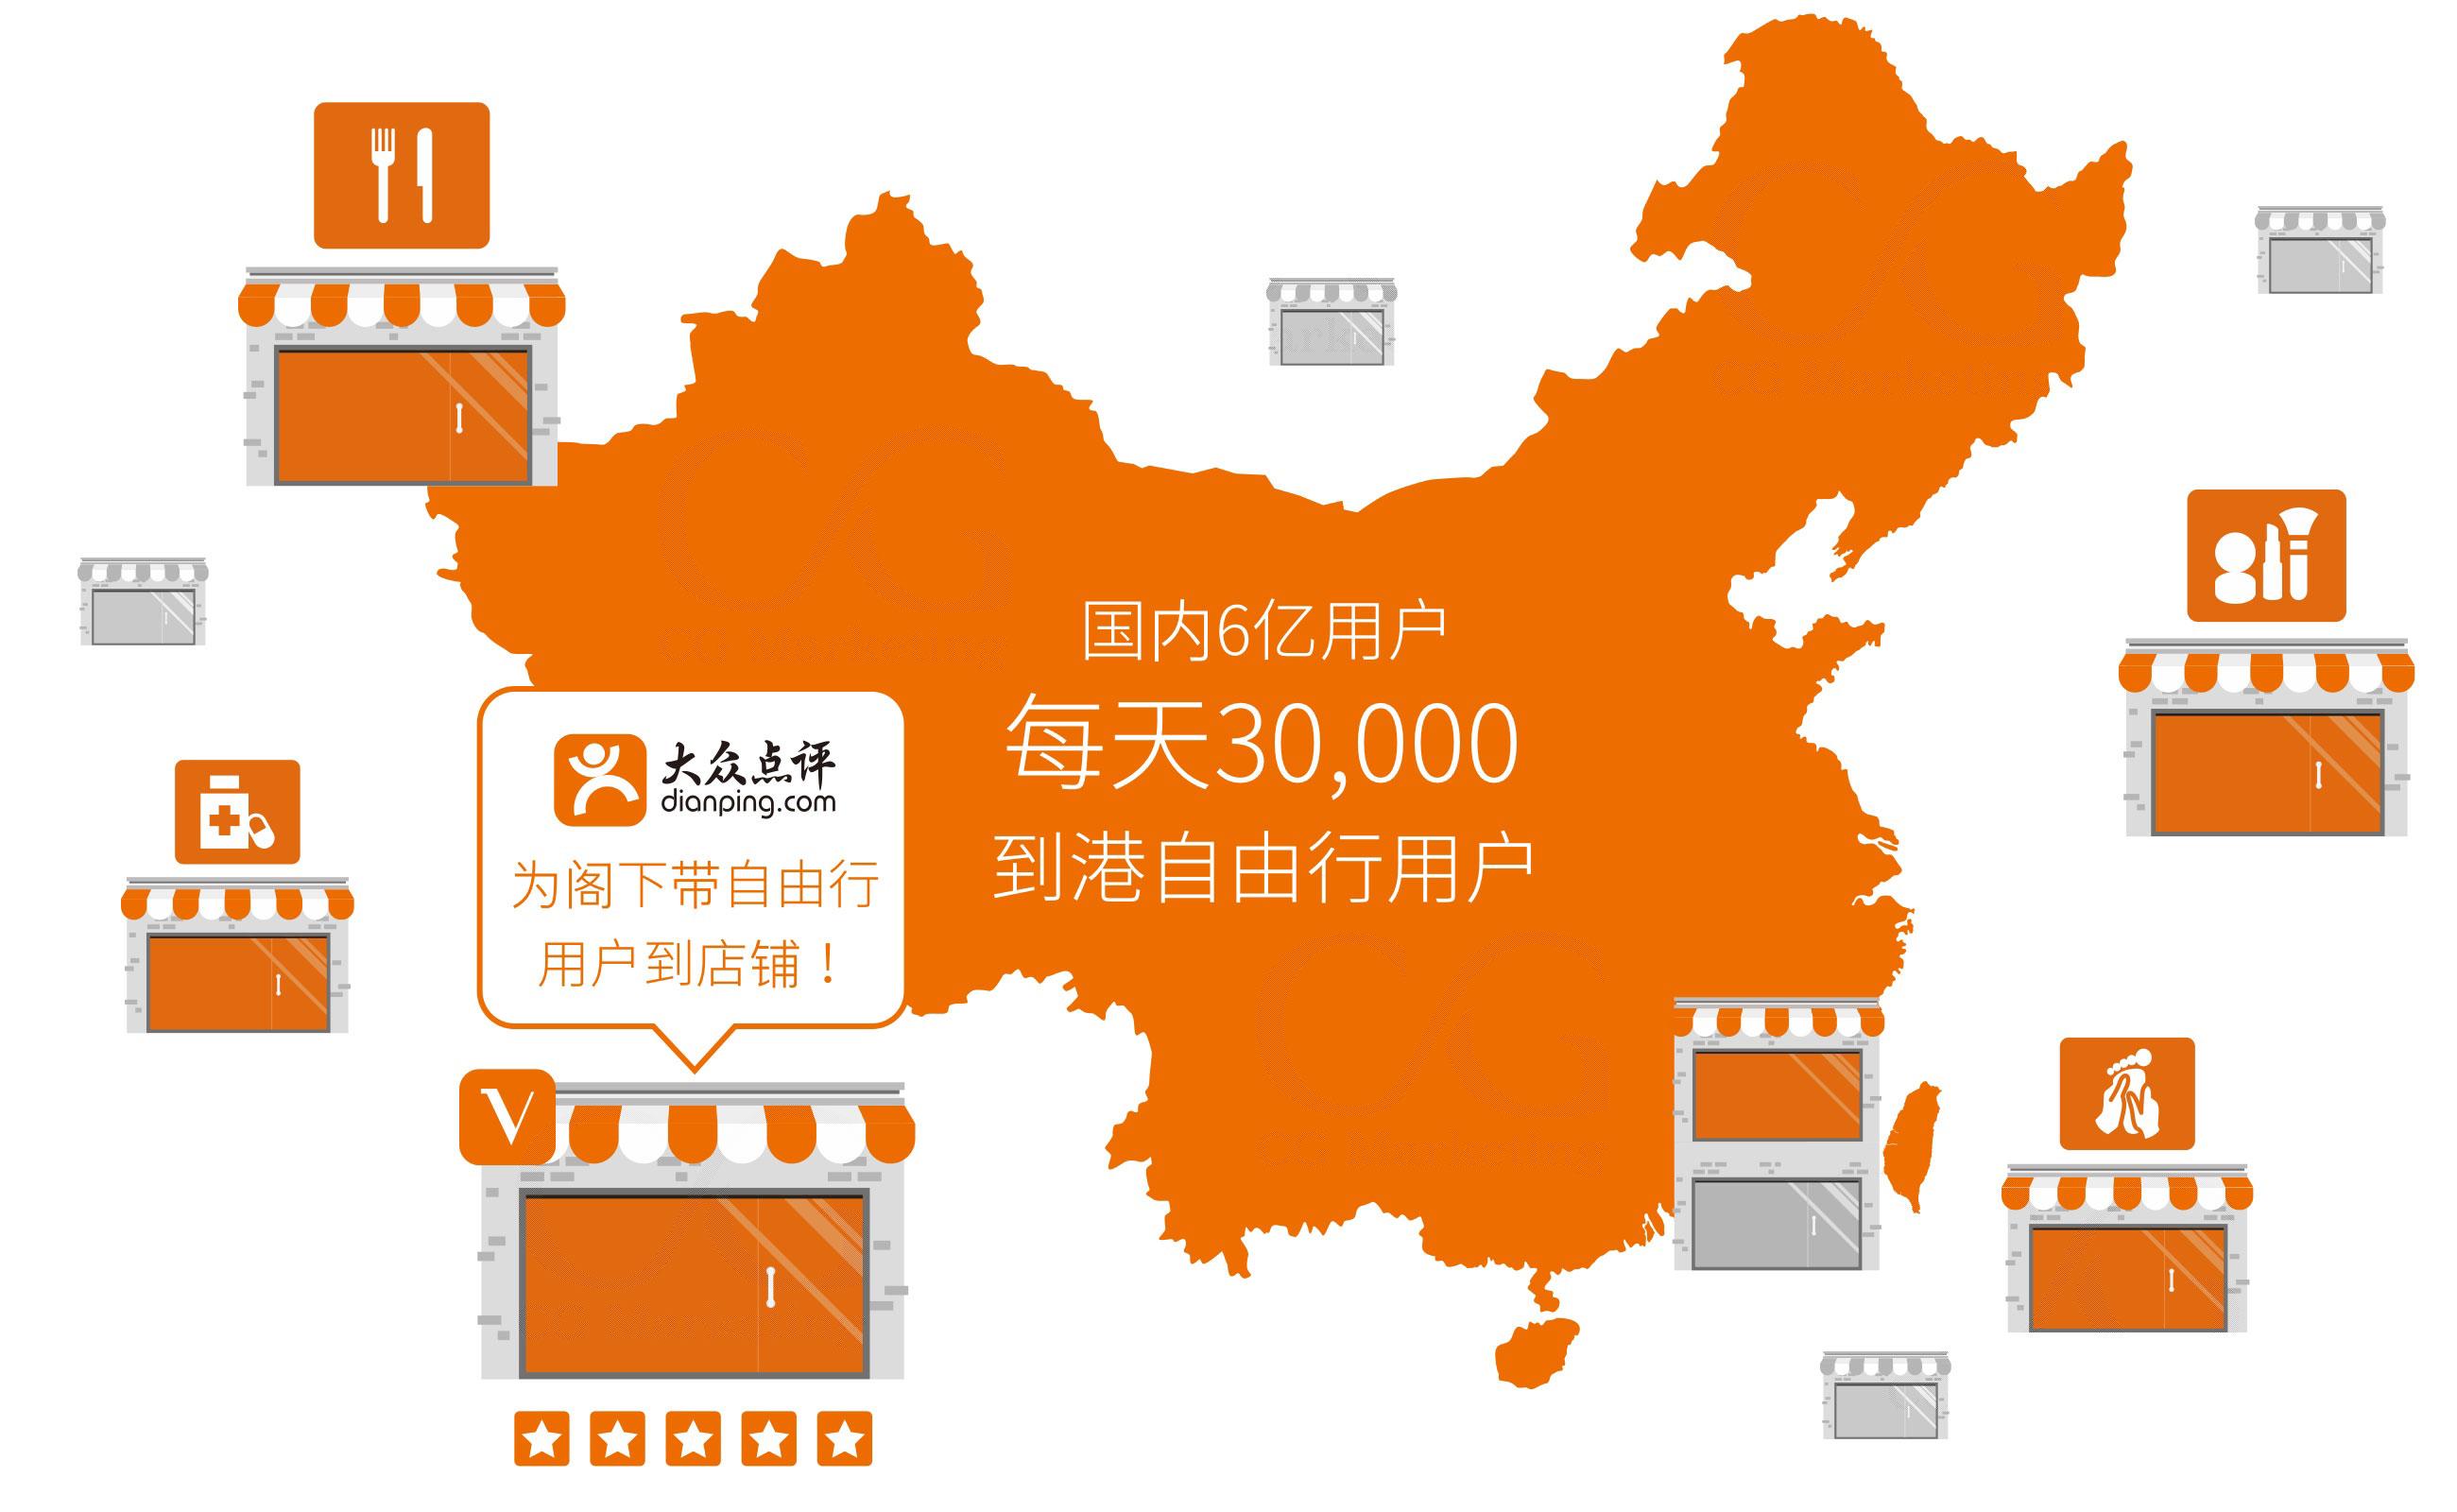 diaping_china_map